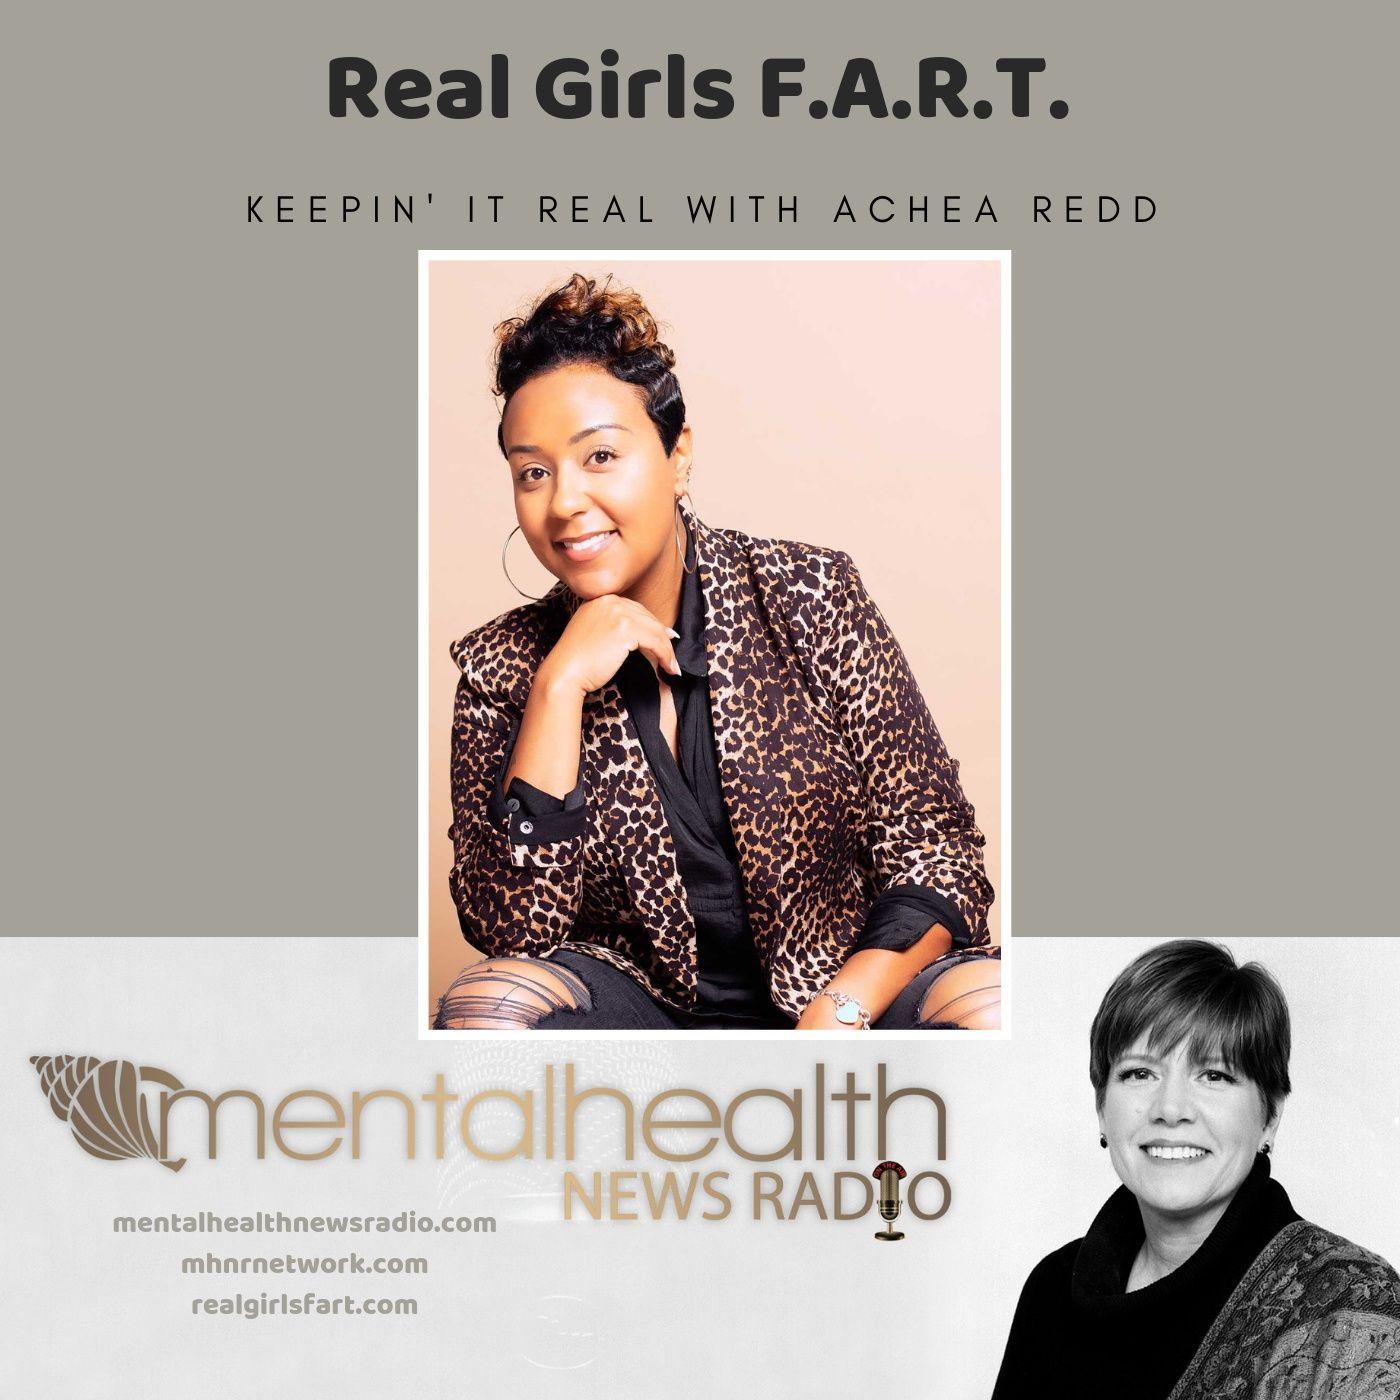 Mental Health News Radio - Real Girls F.A.R.T.: Keepin It Real with Achea Redd